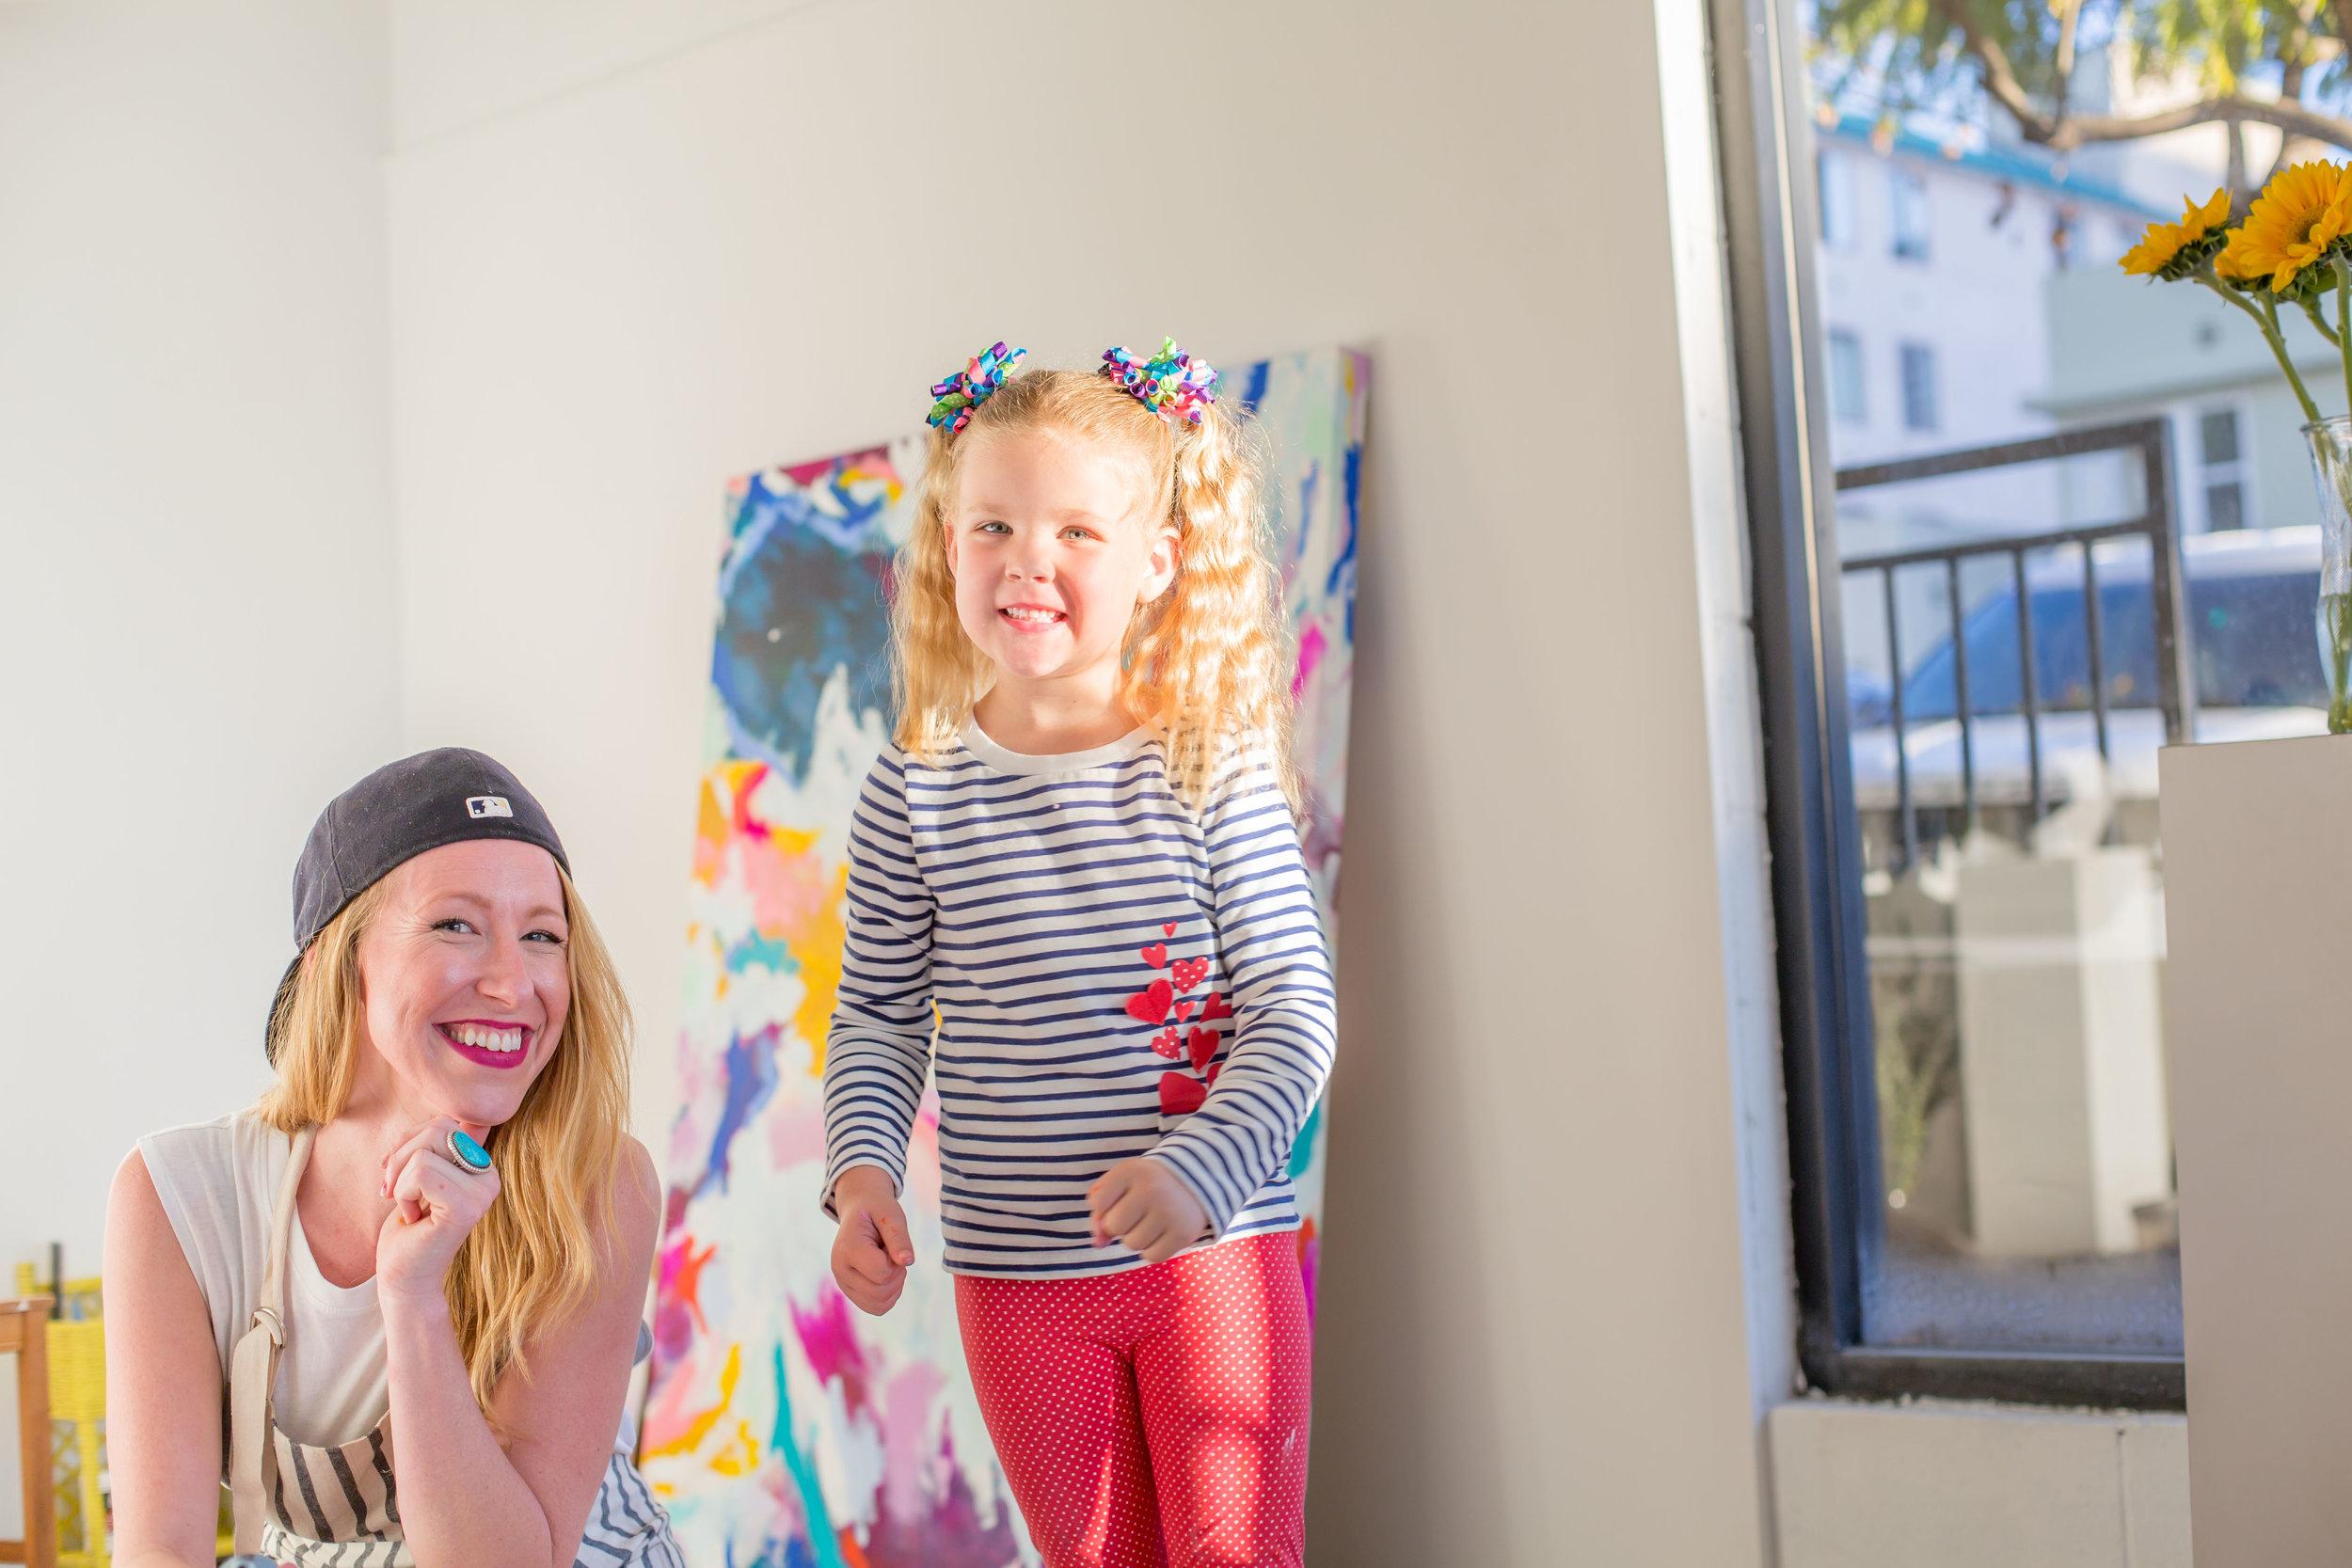 san-diego-branding-photographer-kids-painting-samantha-louise-marett-artist-9